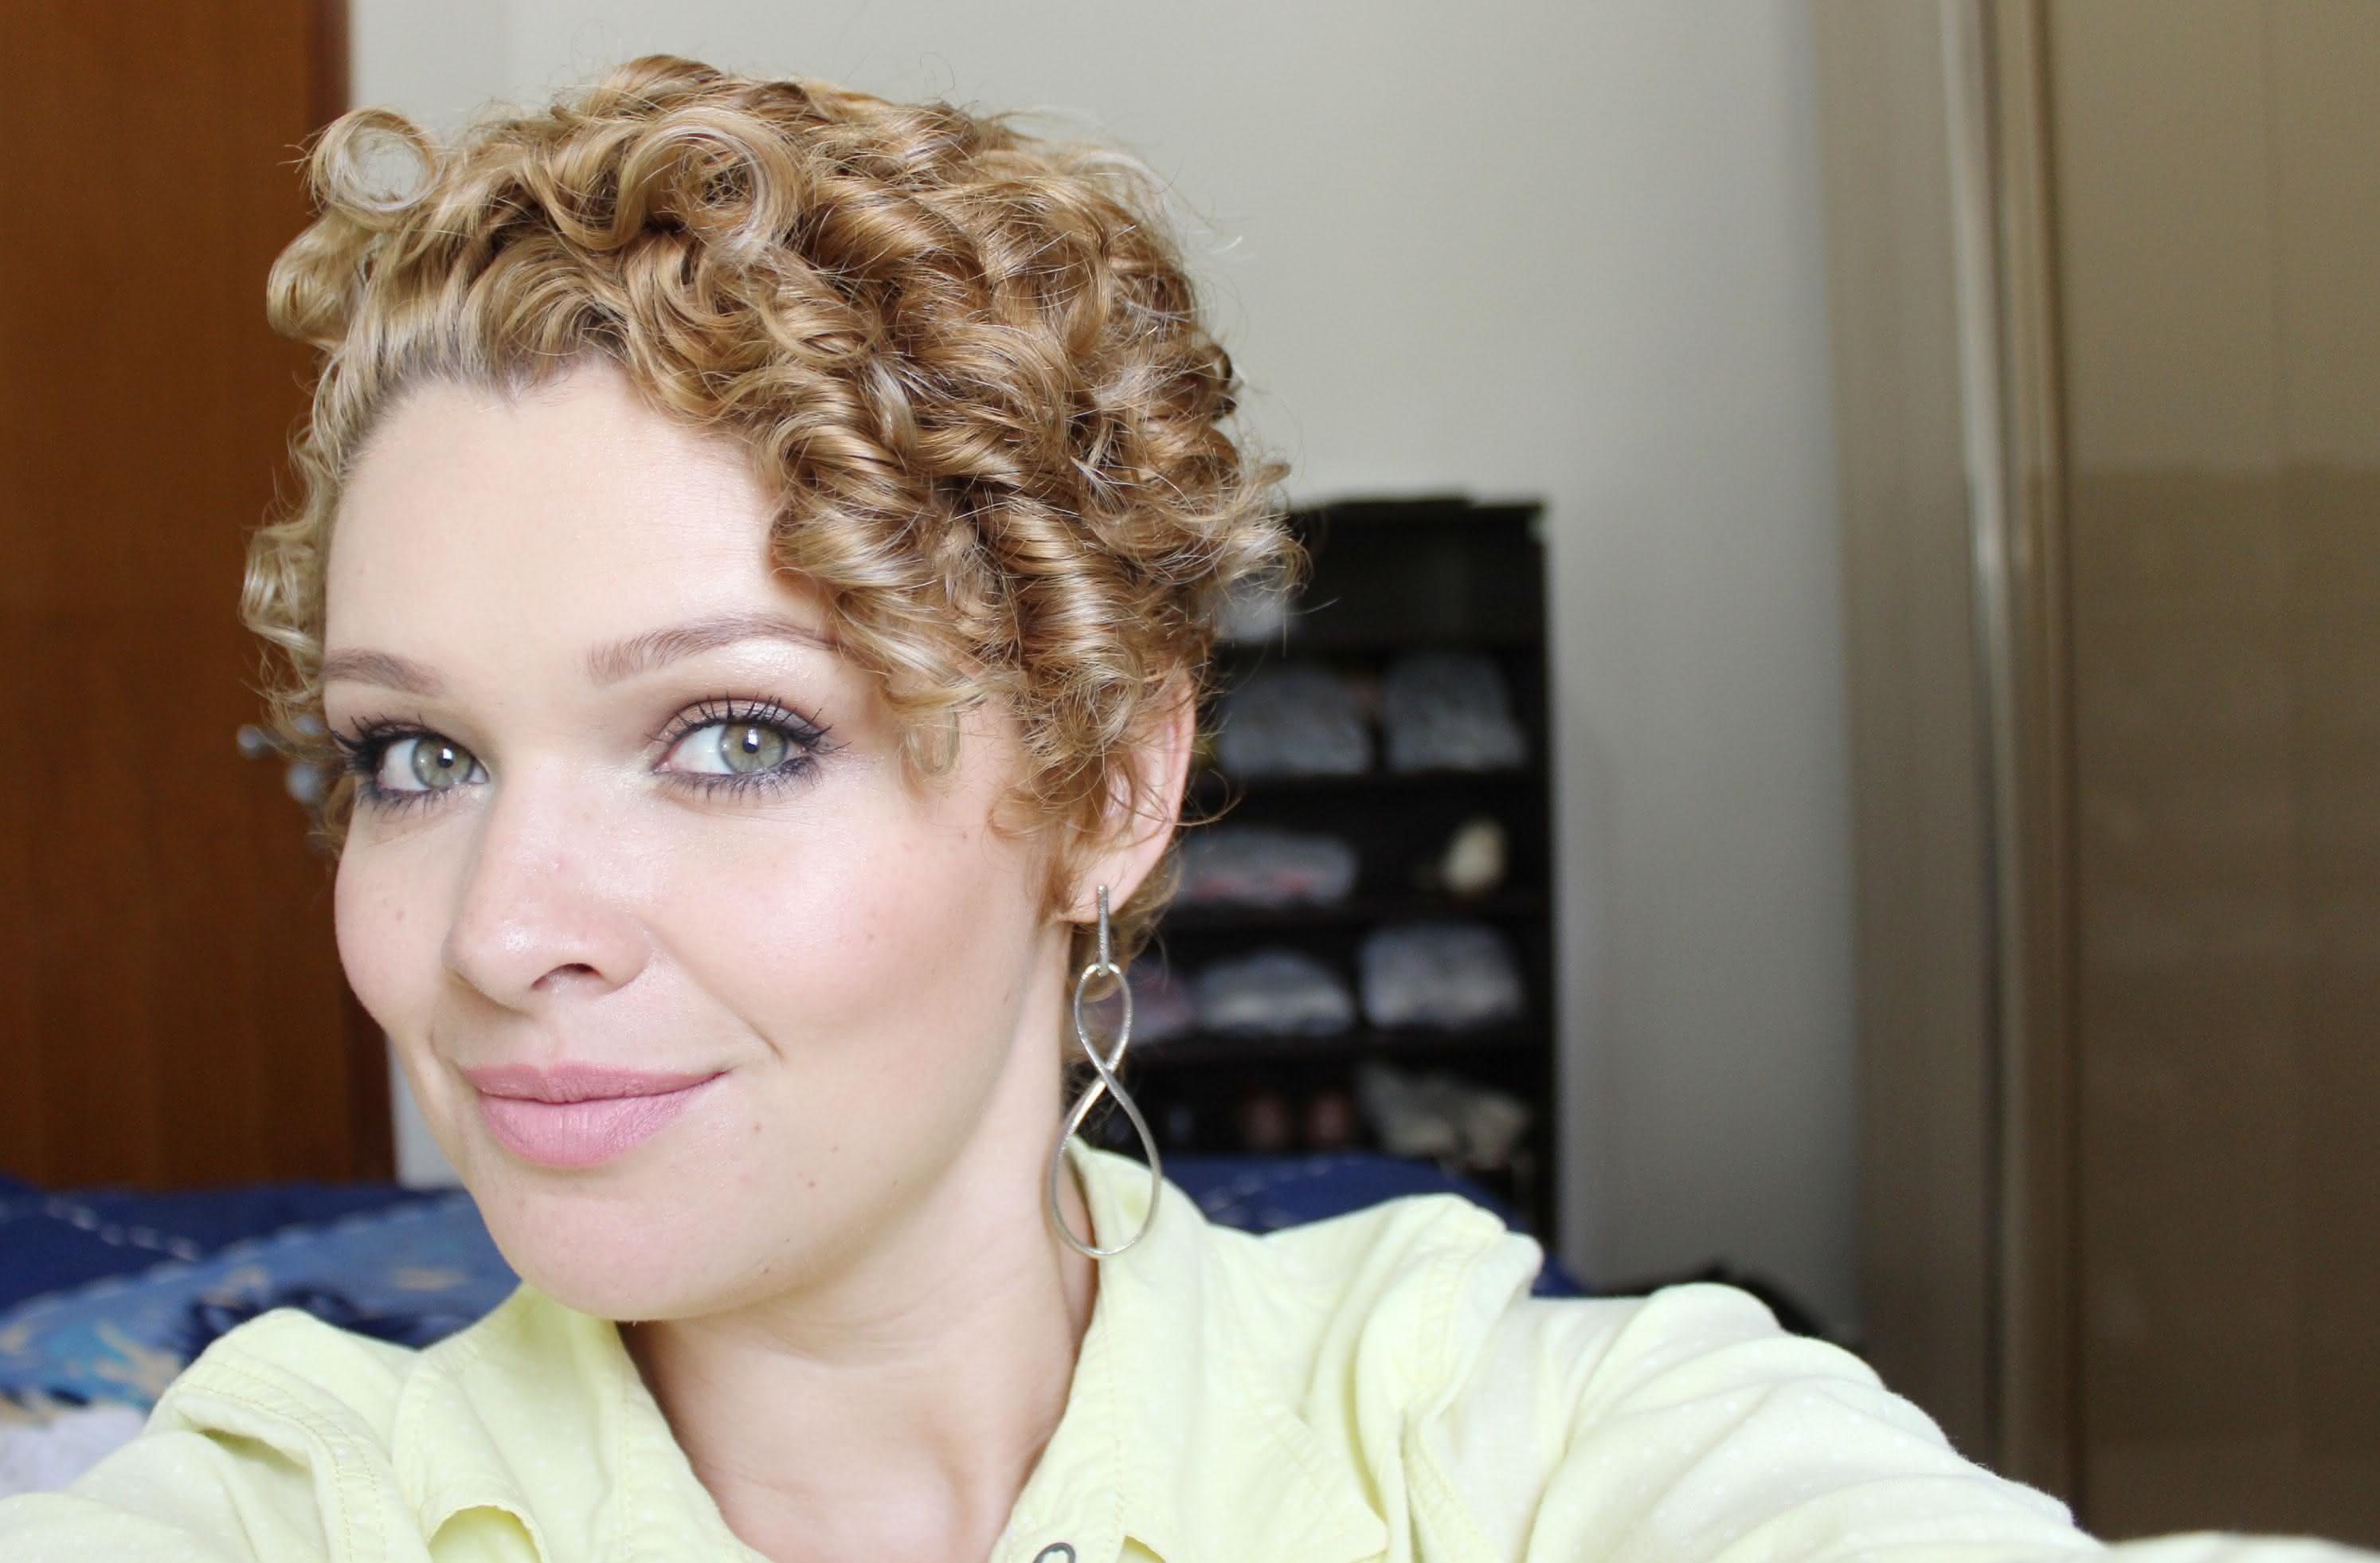 arrumando-cabelo-cacheado-curto-3